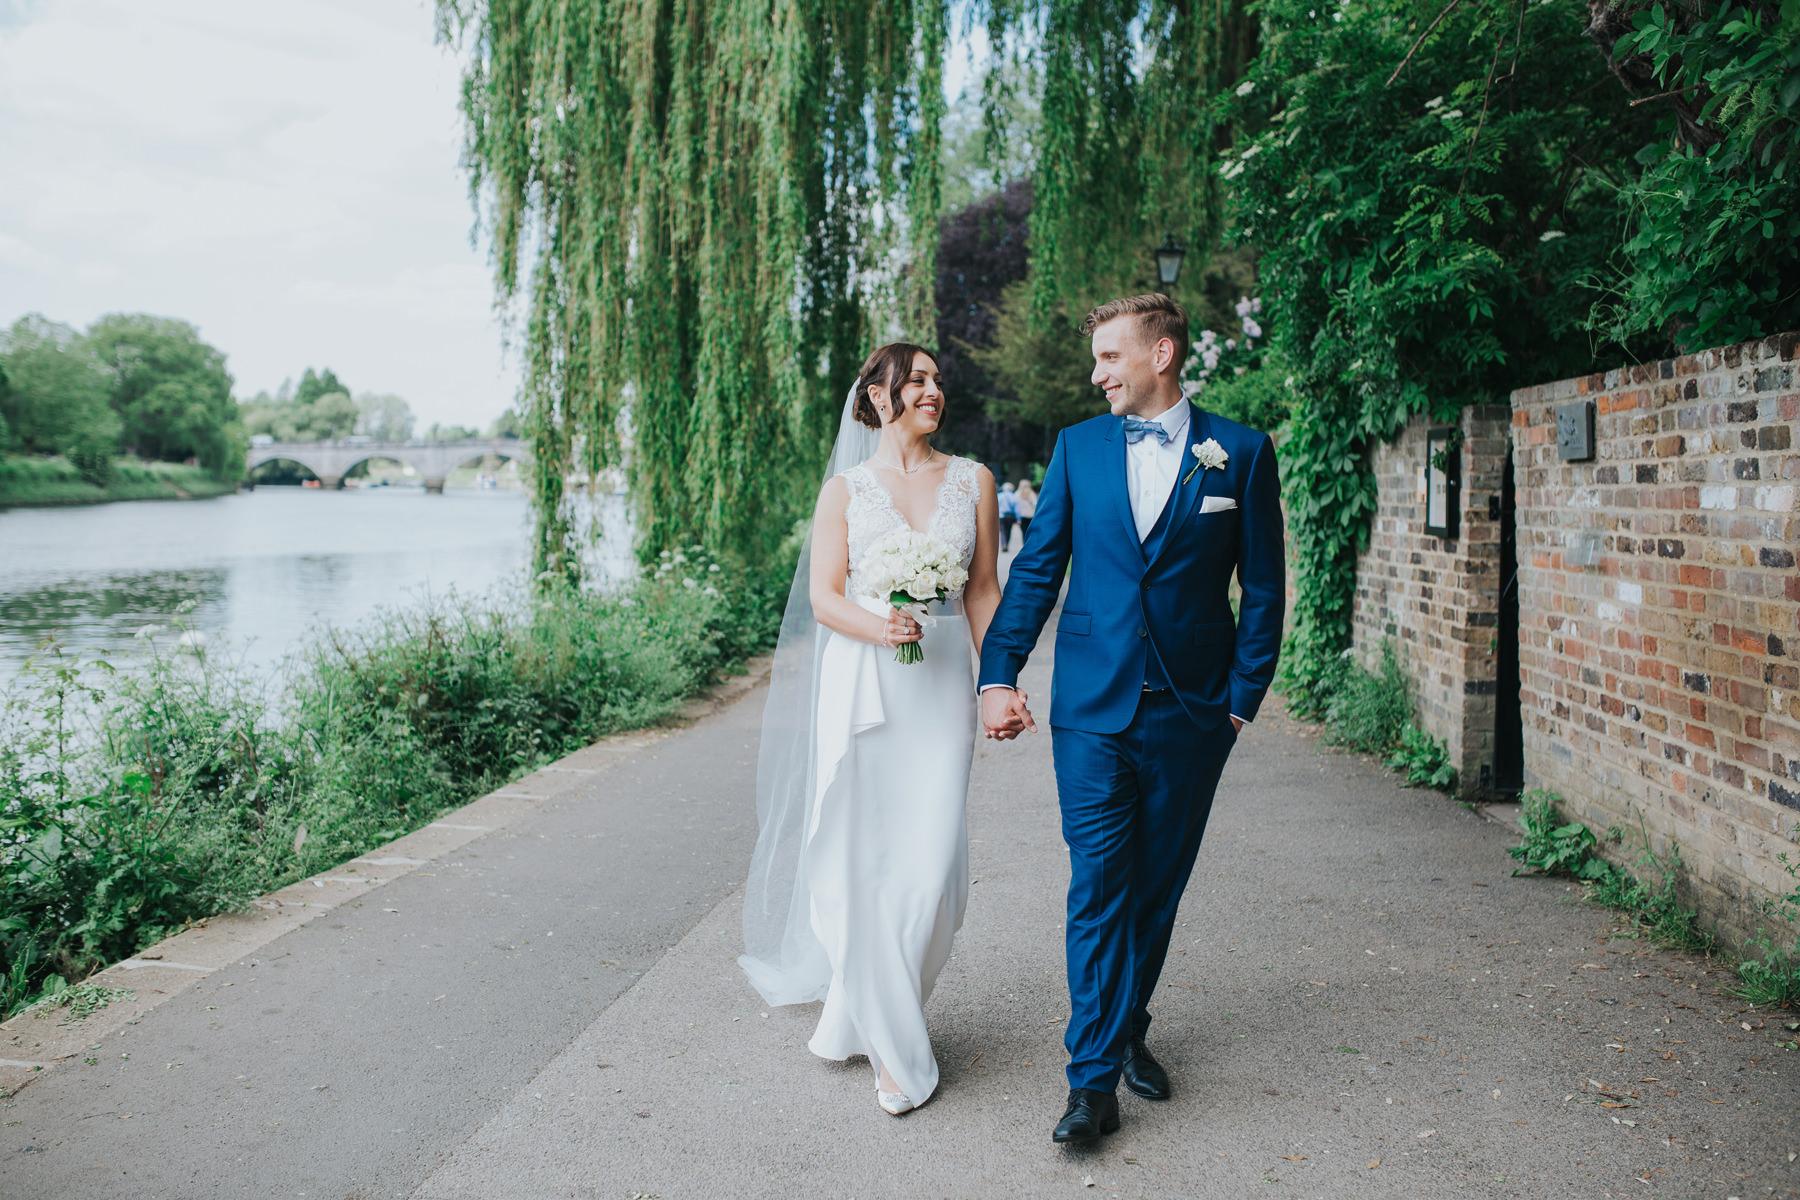 CRL-339-The Bingham wedding Richmond-Claire Rob bridal couple portraits on Thamespath.jpg